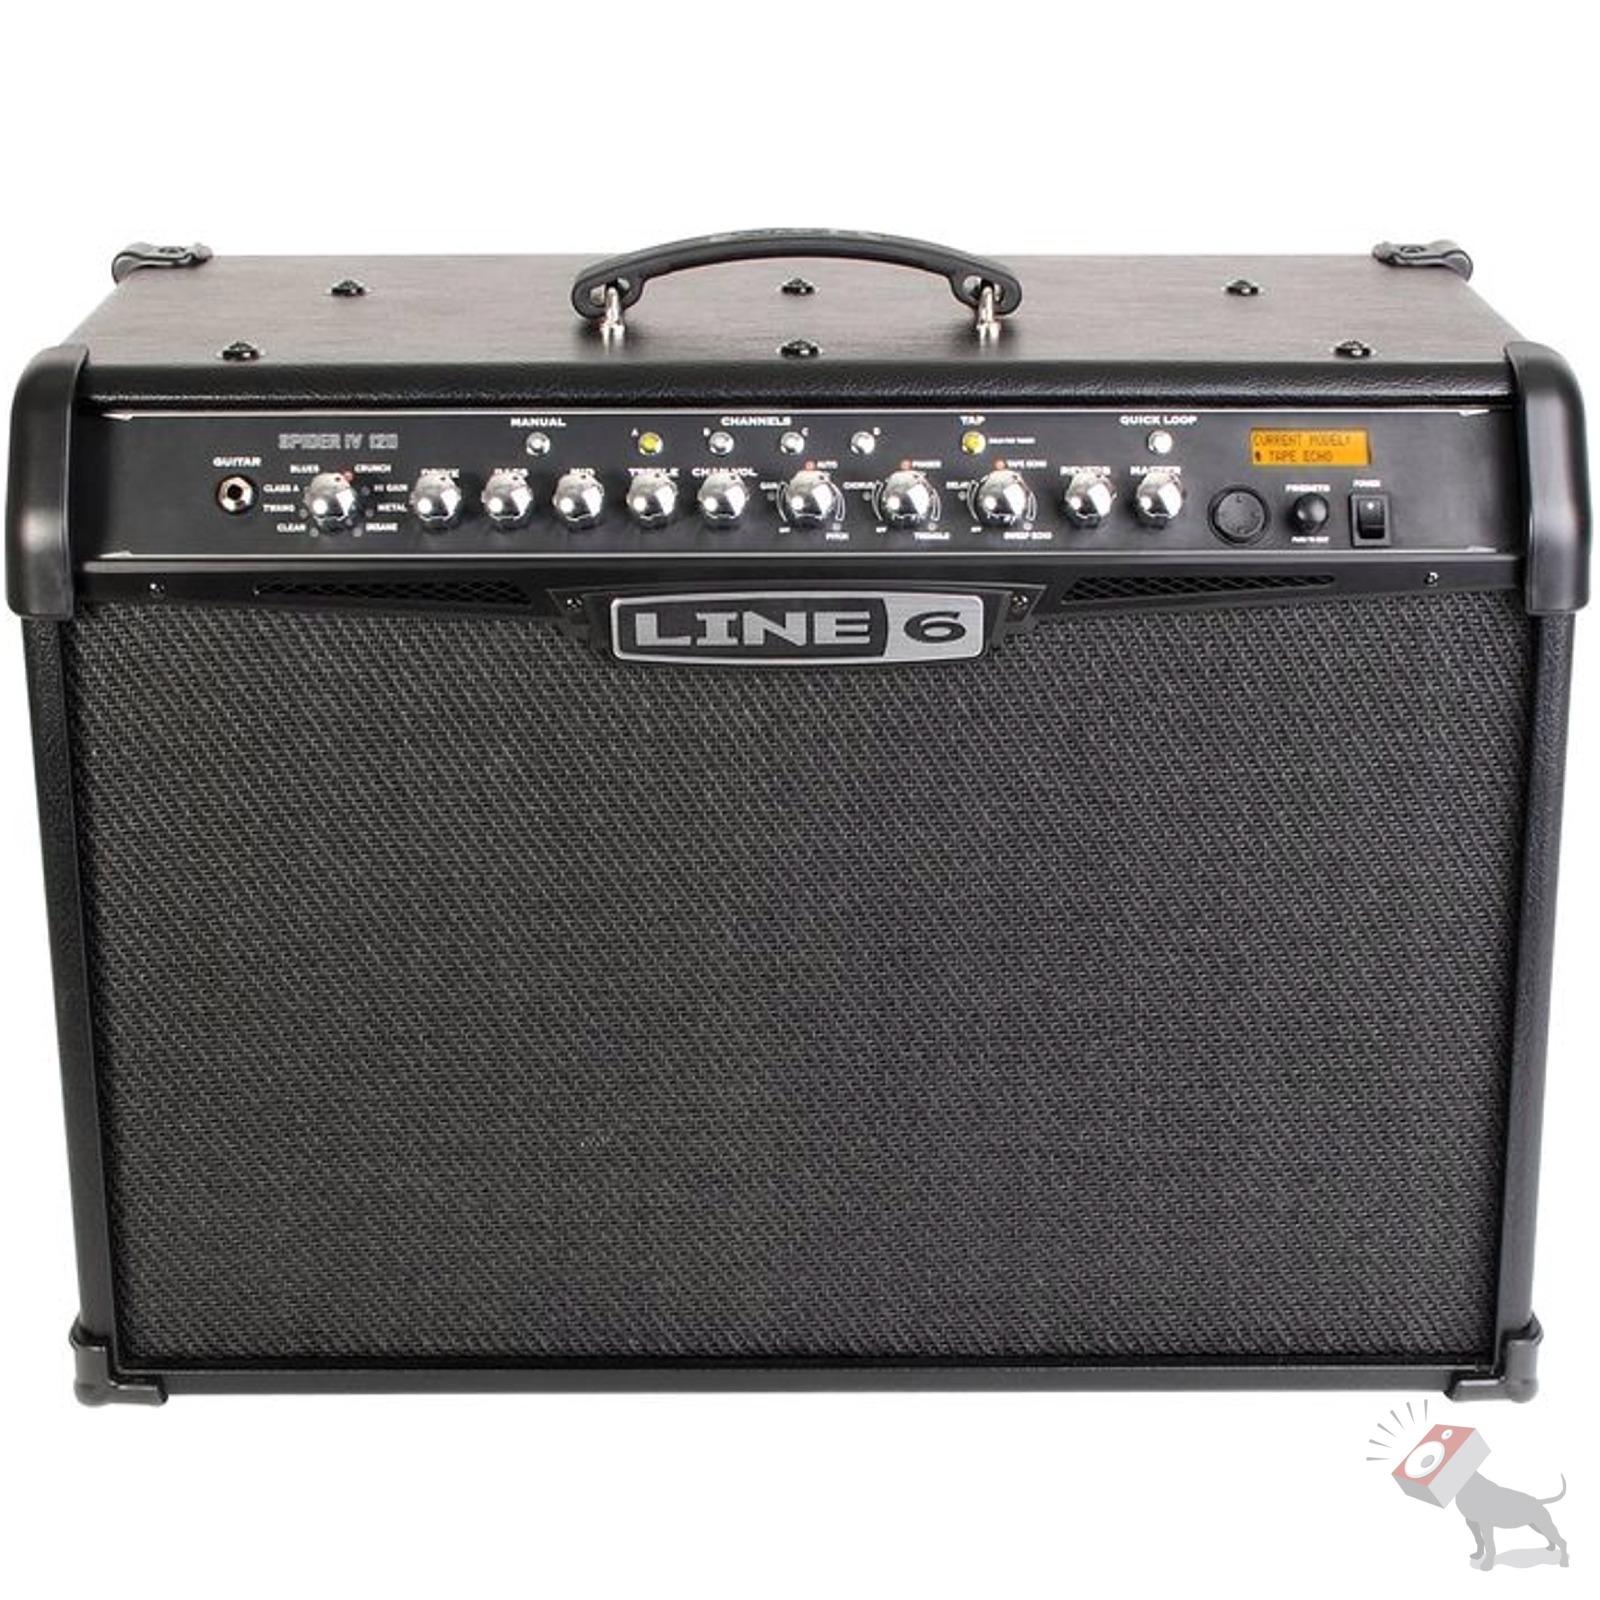 Line 6 Amplifiers : line 6 spider iv 4 amplifier 120 120w 2x10 guitar combo 120 watt amp ebay ~ Hamham.info Haus und Dekorationen